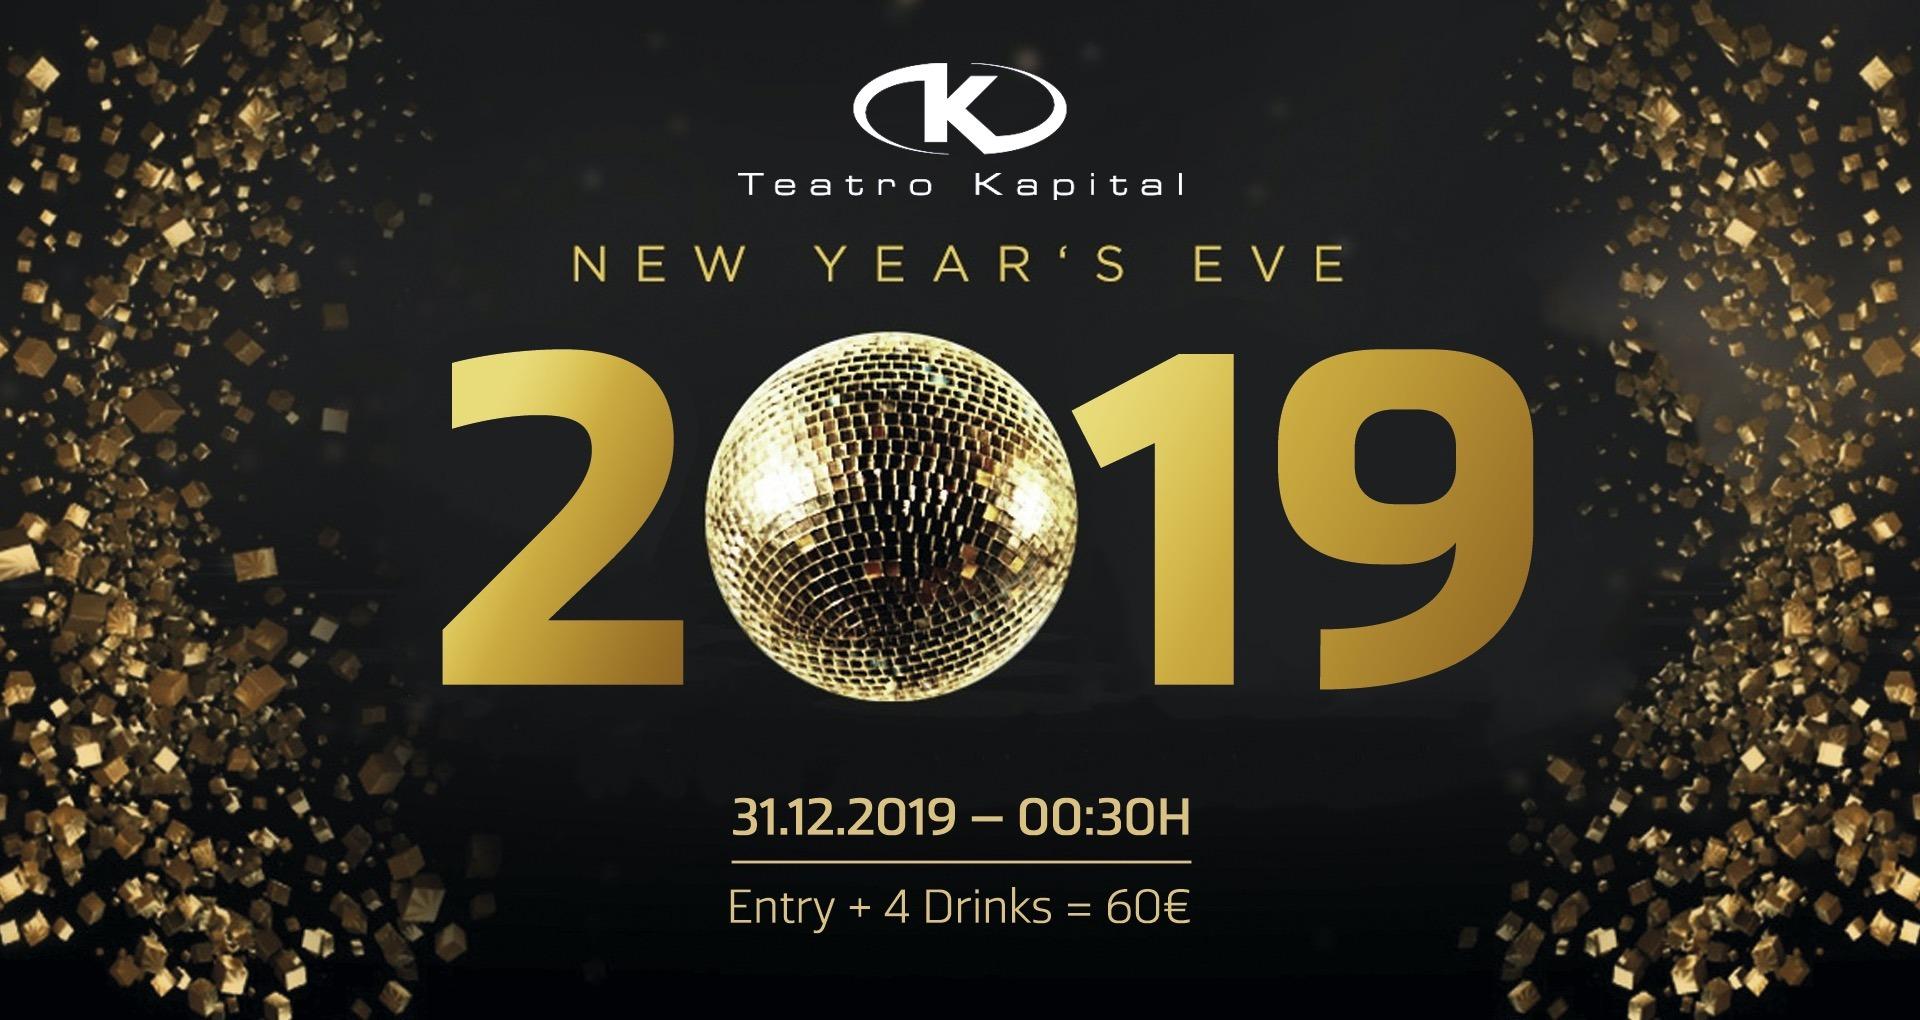 New Year's Eve at Teatro Kapital - Club Teatro Kapital